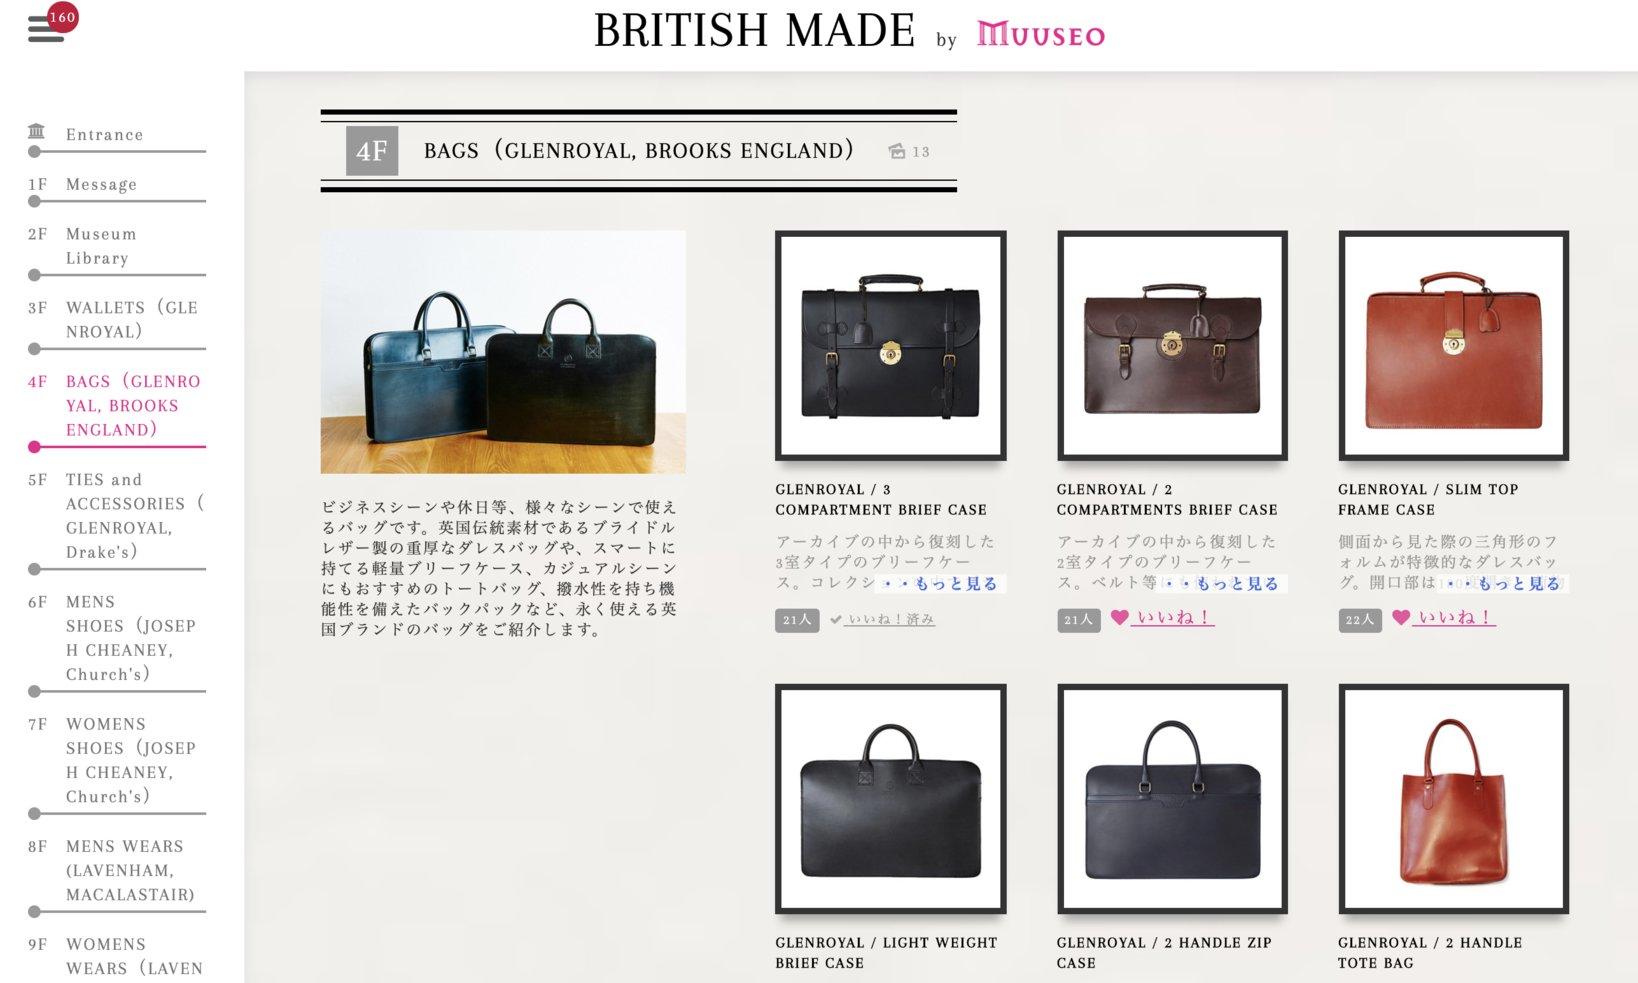 BRITISH MADE MUSEUMには、色褪せない美しさを纏う英国製品が展示されている。